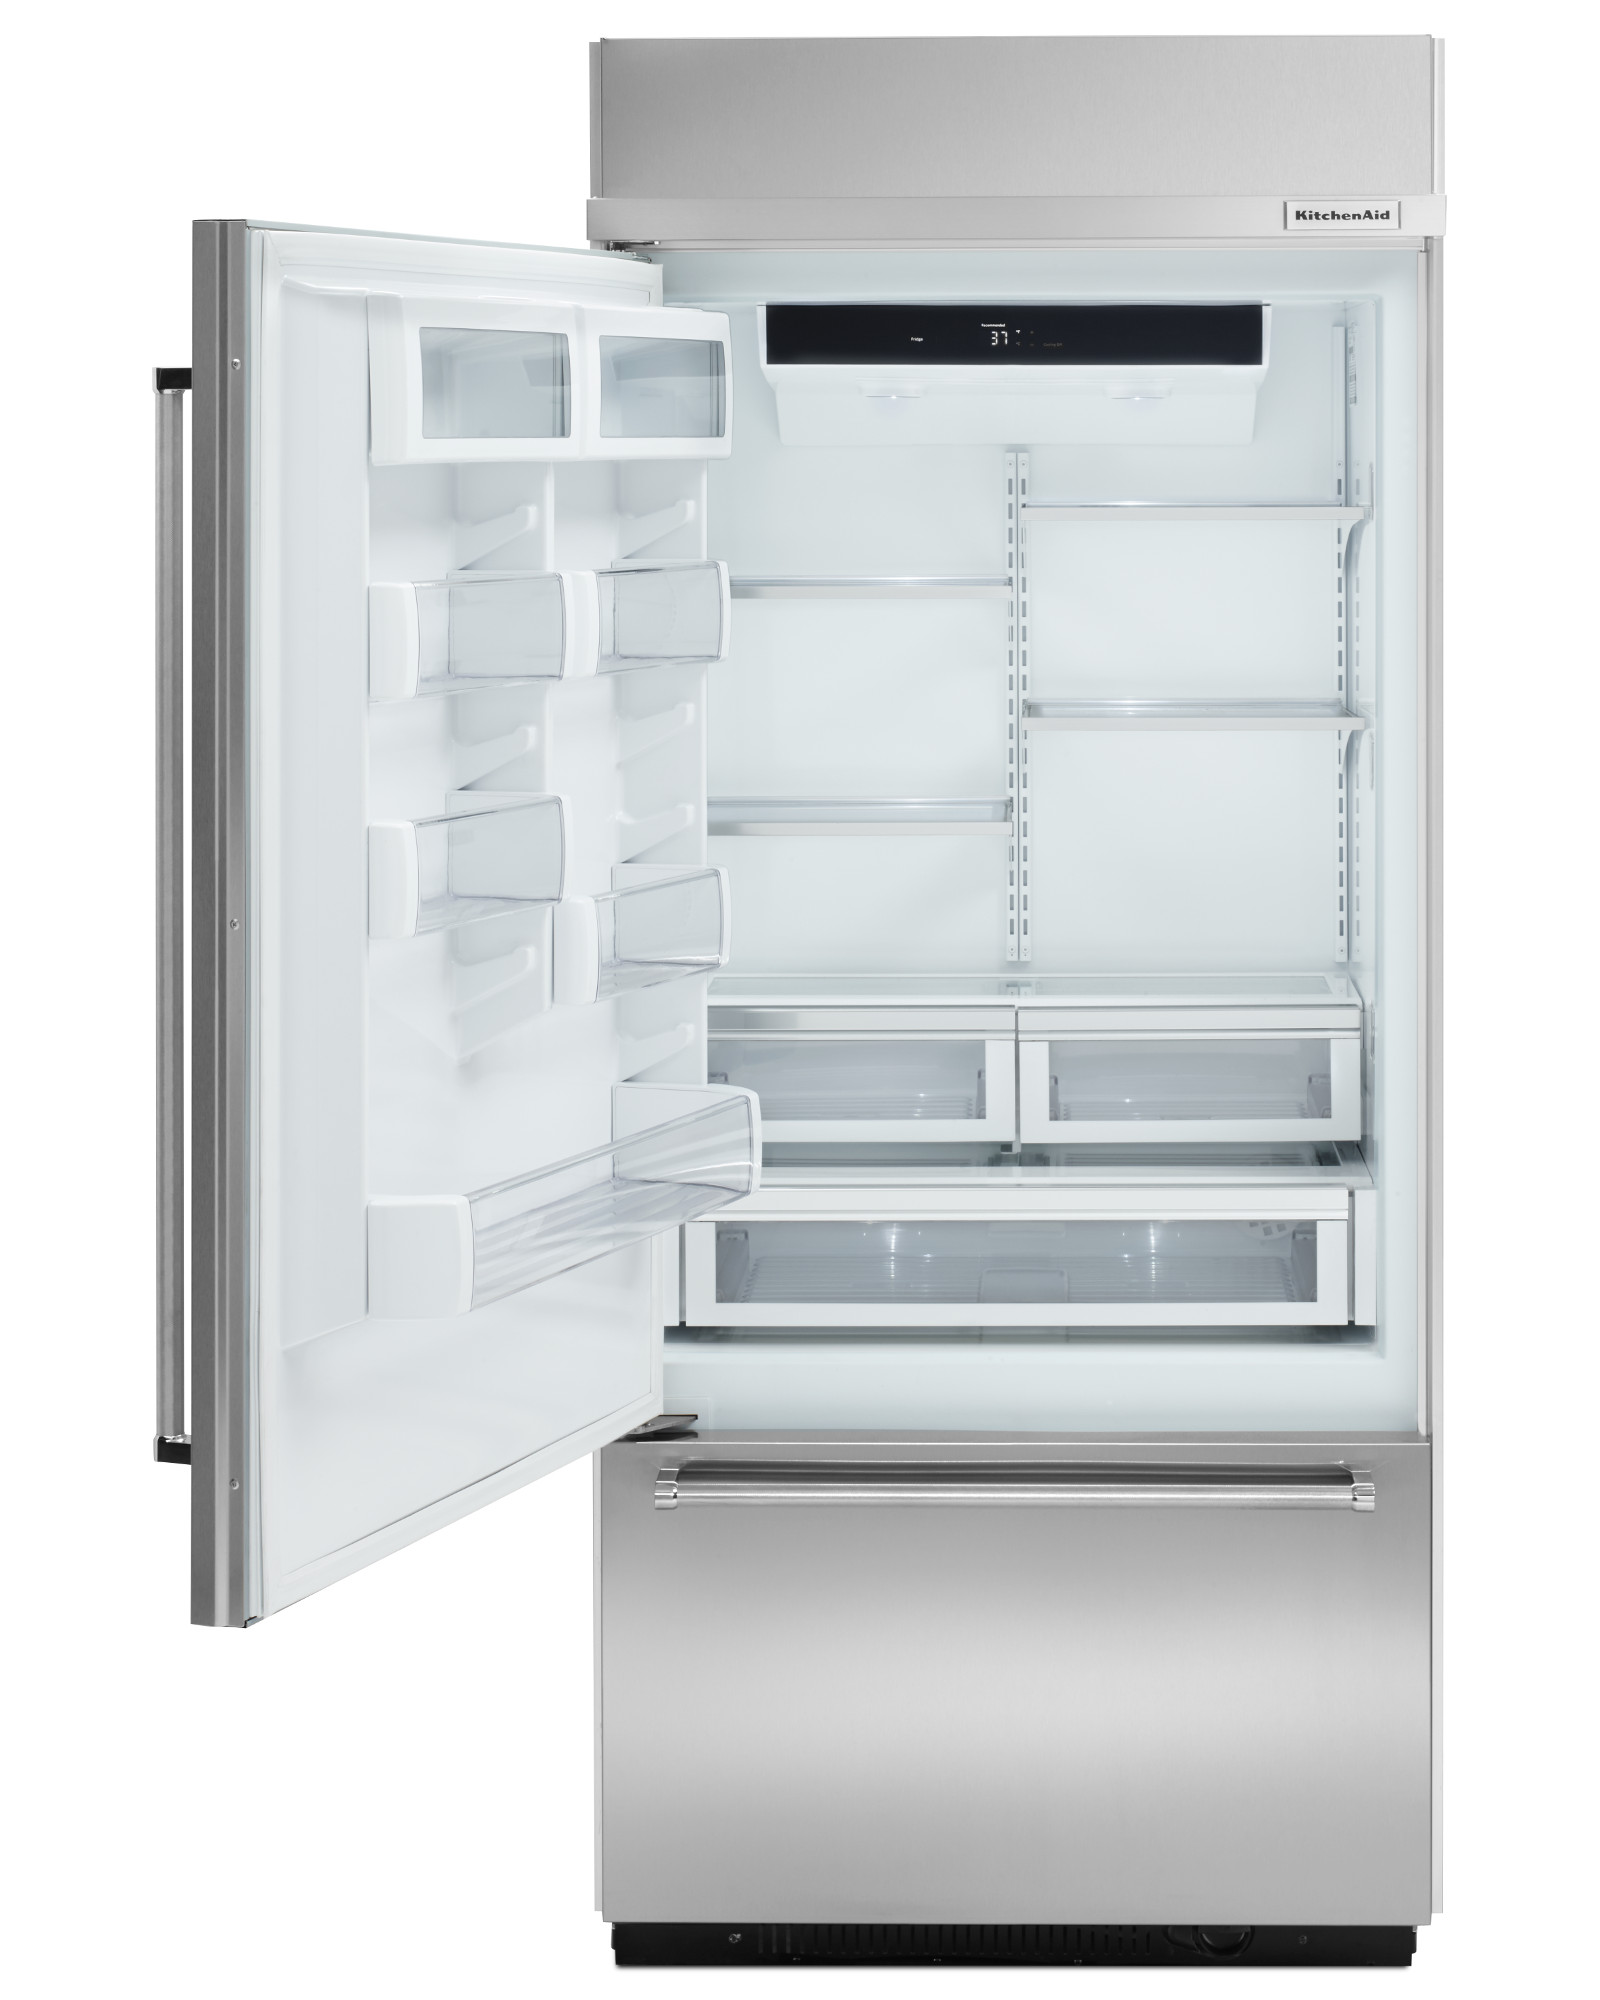 KitchenAid KBBL206ESS 20.9 cu. ft. Built-In Bottom Freezer Refrigerator - Stainless Steel